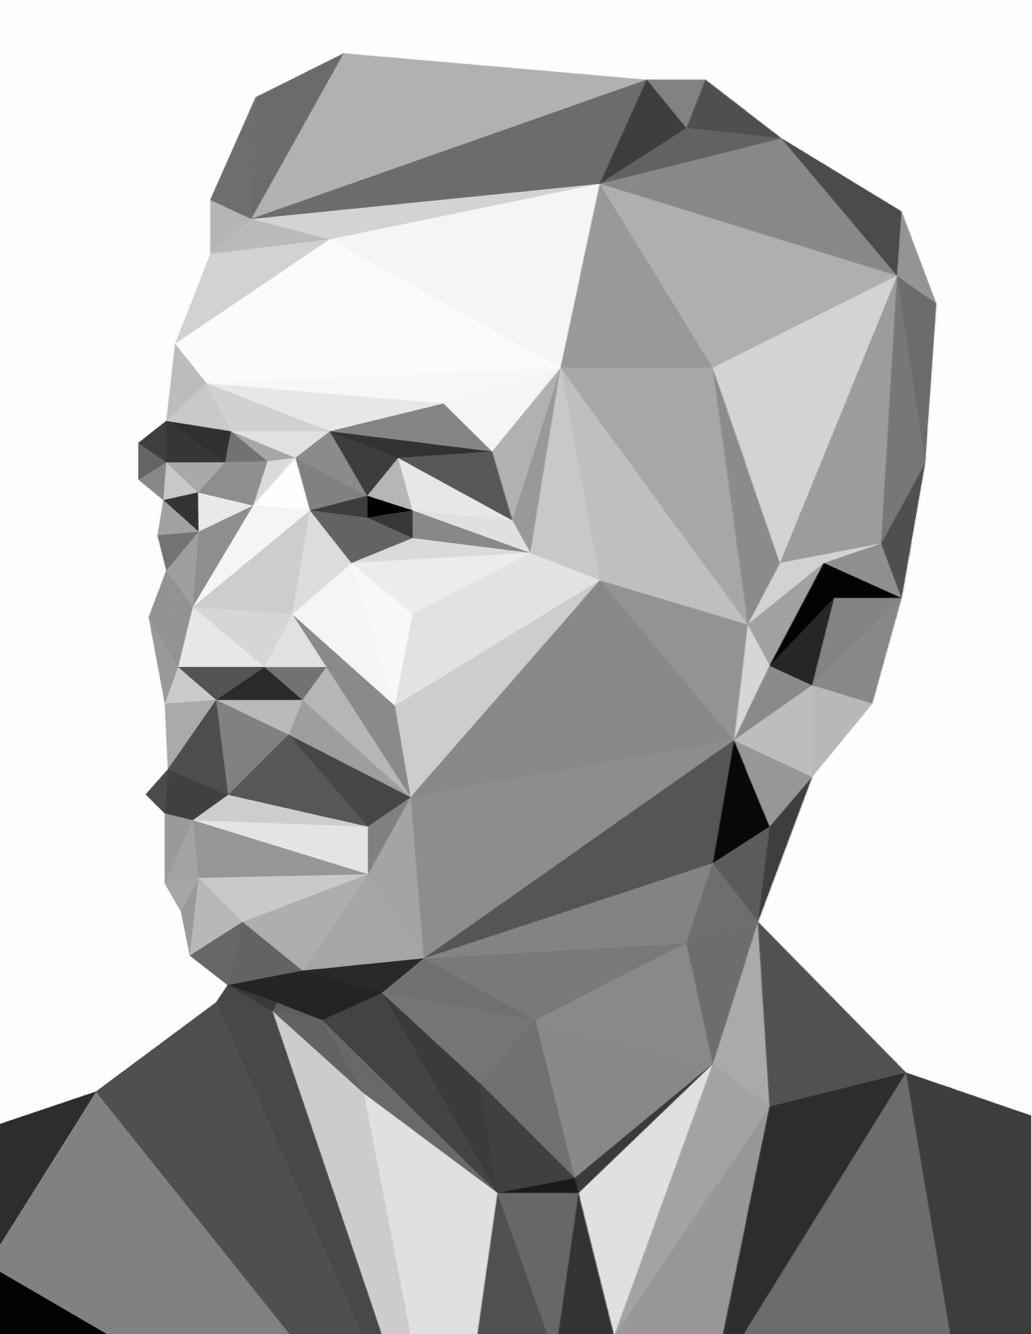 william faulkner nobel acceptance speech